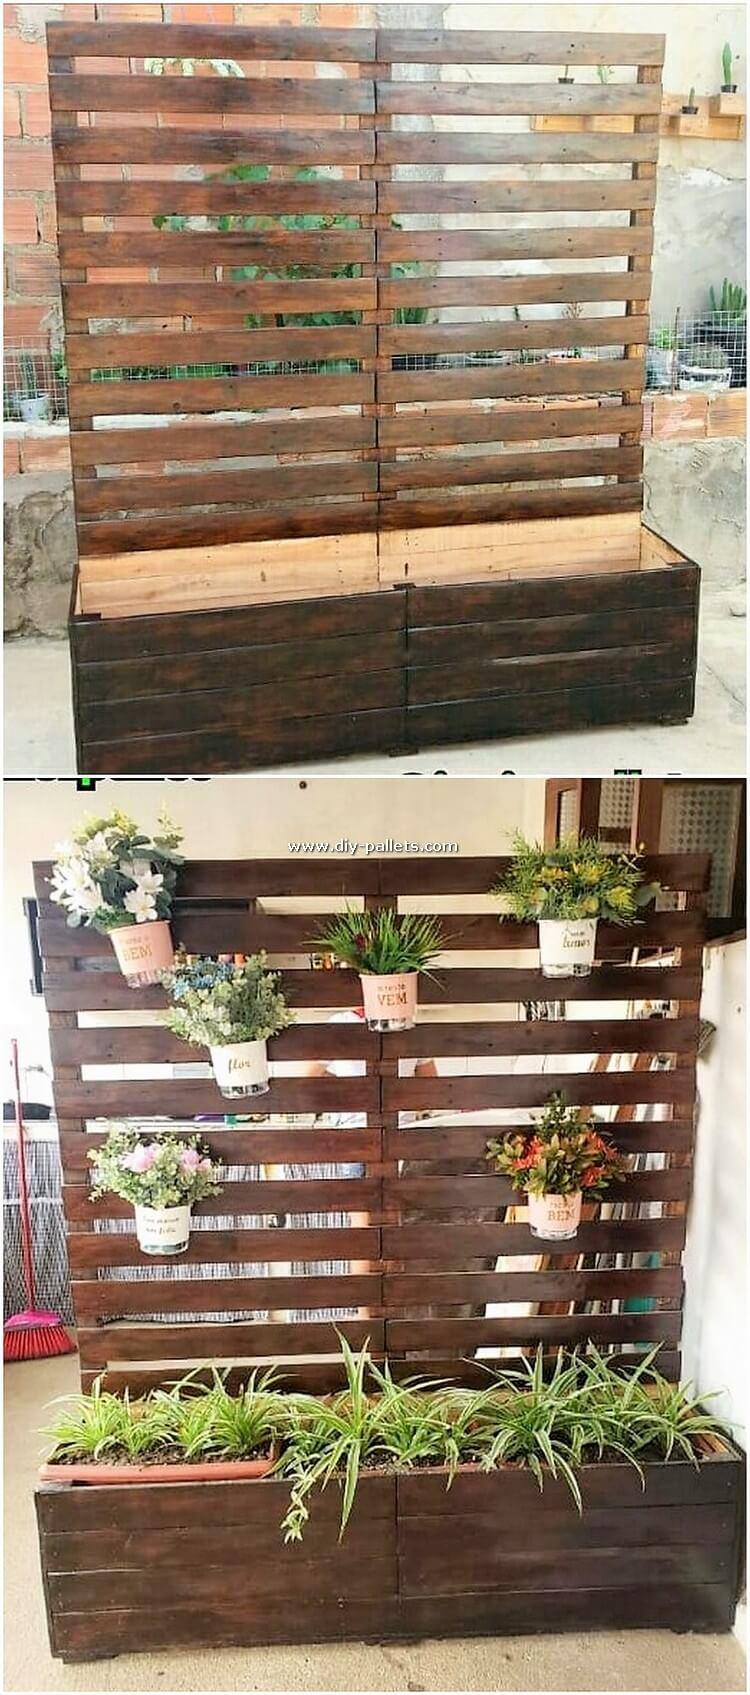 Pallet Planter